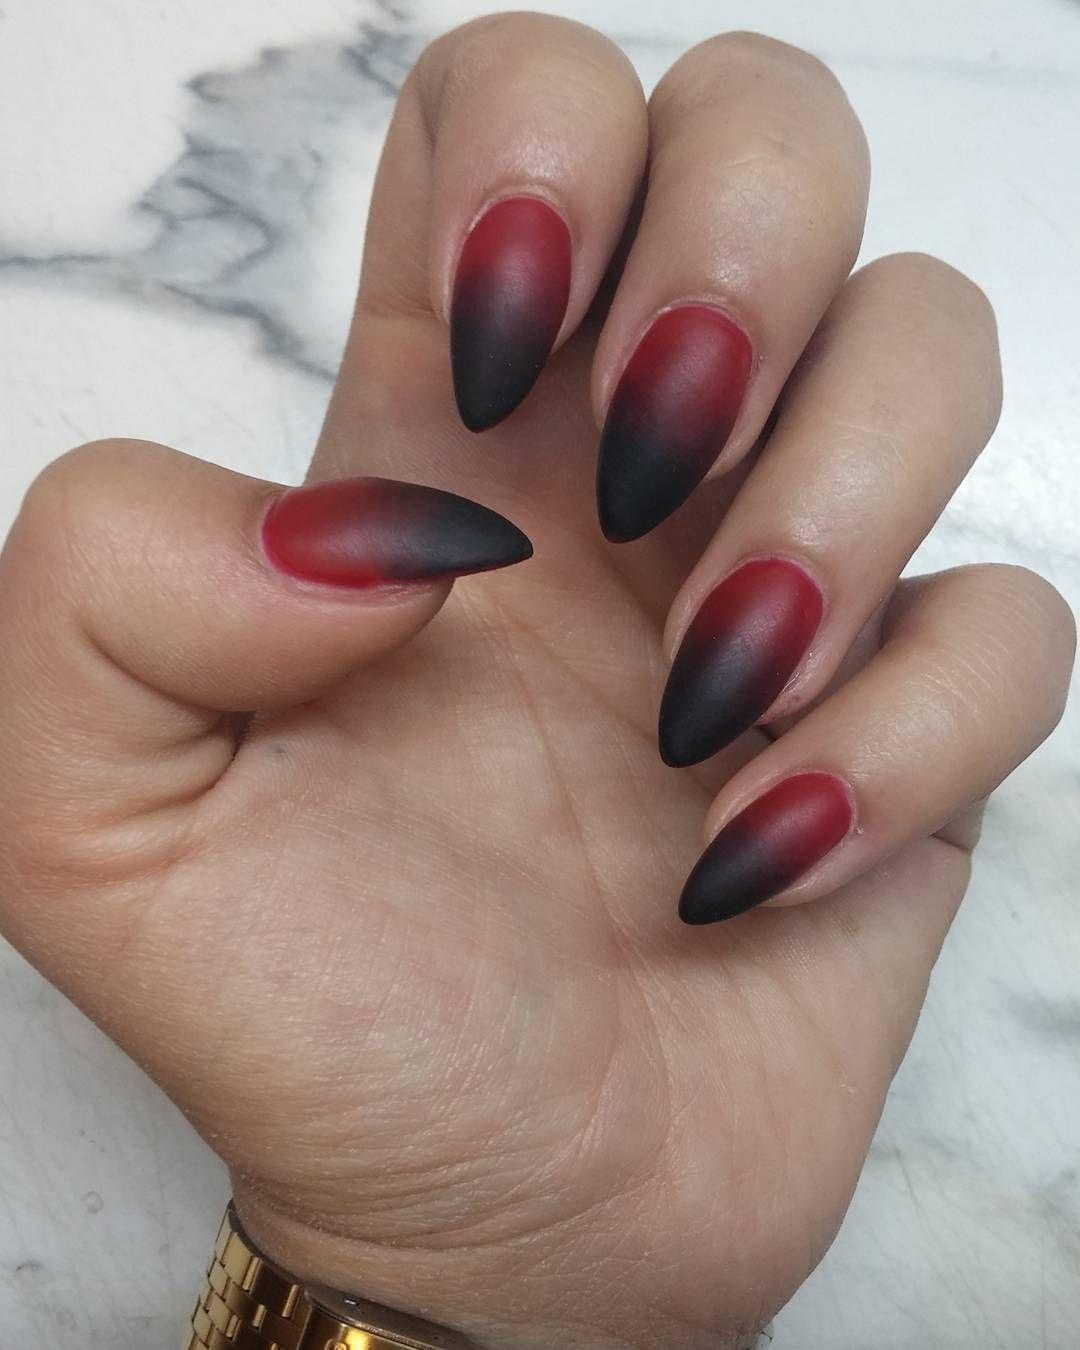 12 Creepy Vampire Nail Art Ideas That Even Dracula Would Love - 12 Creepy Vampire Nail Art Ideas That Even Dracula Would Love